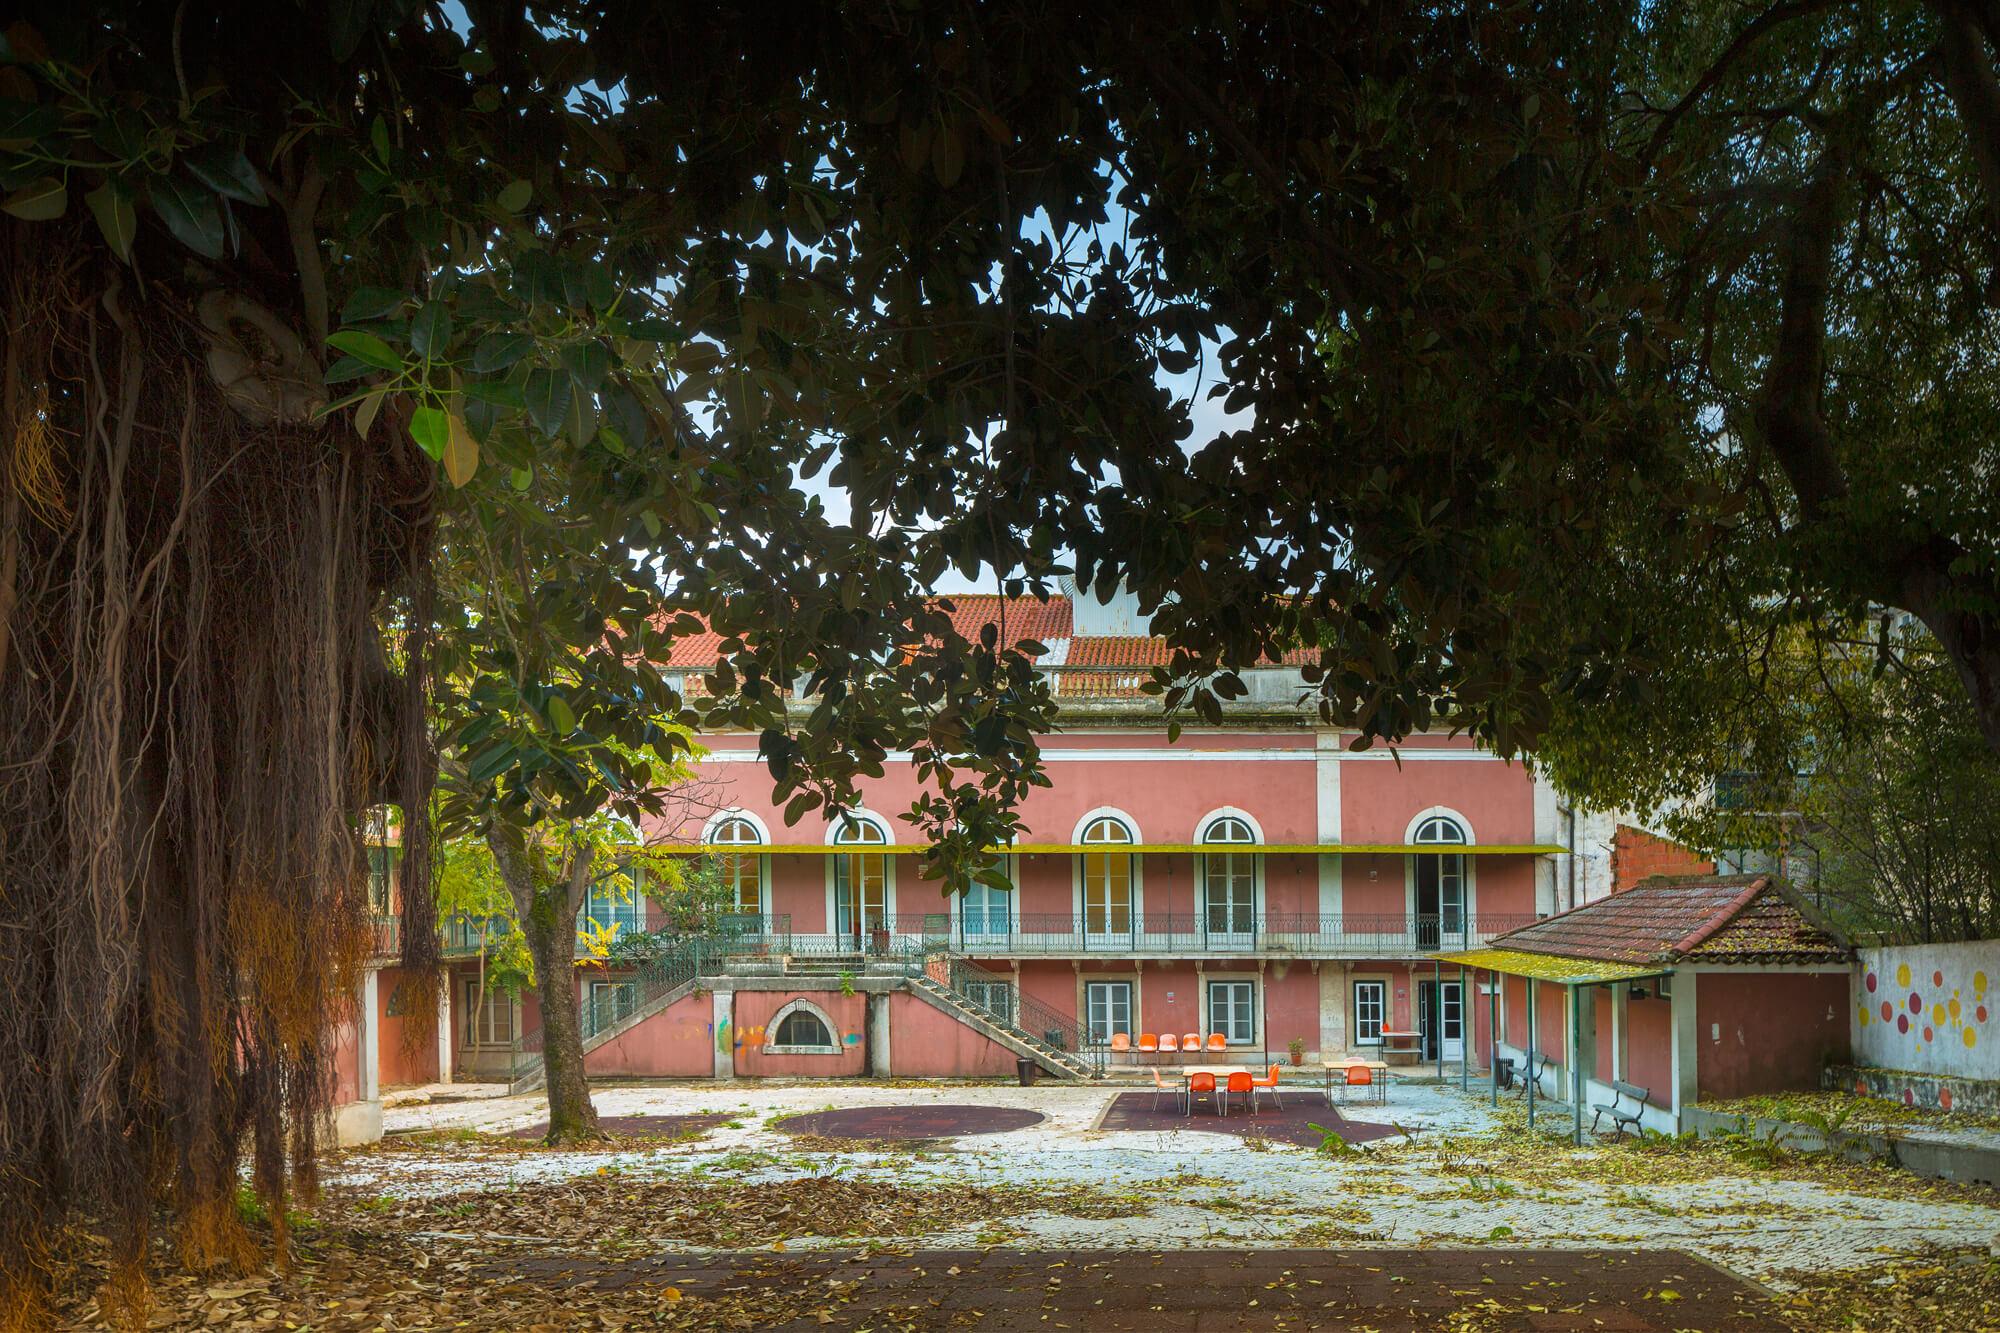 Palácio Sinel de Cordes, Pátio . Pátio Interior © FG+SG, Fotografia de Arquitectura